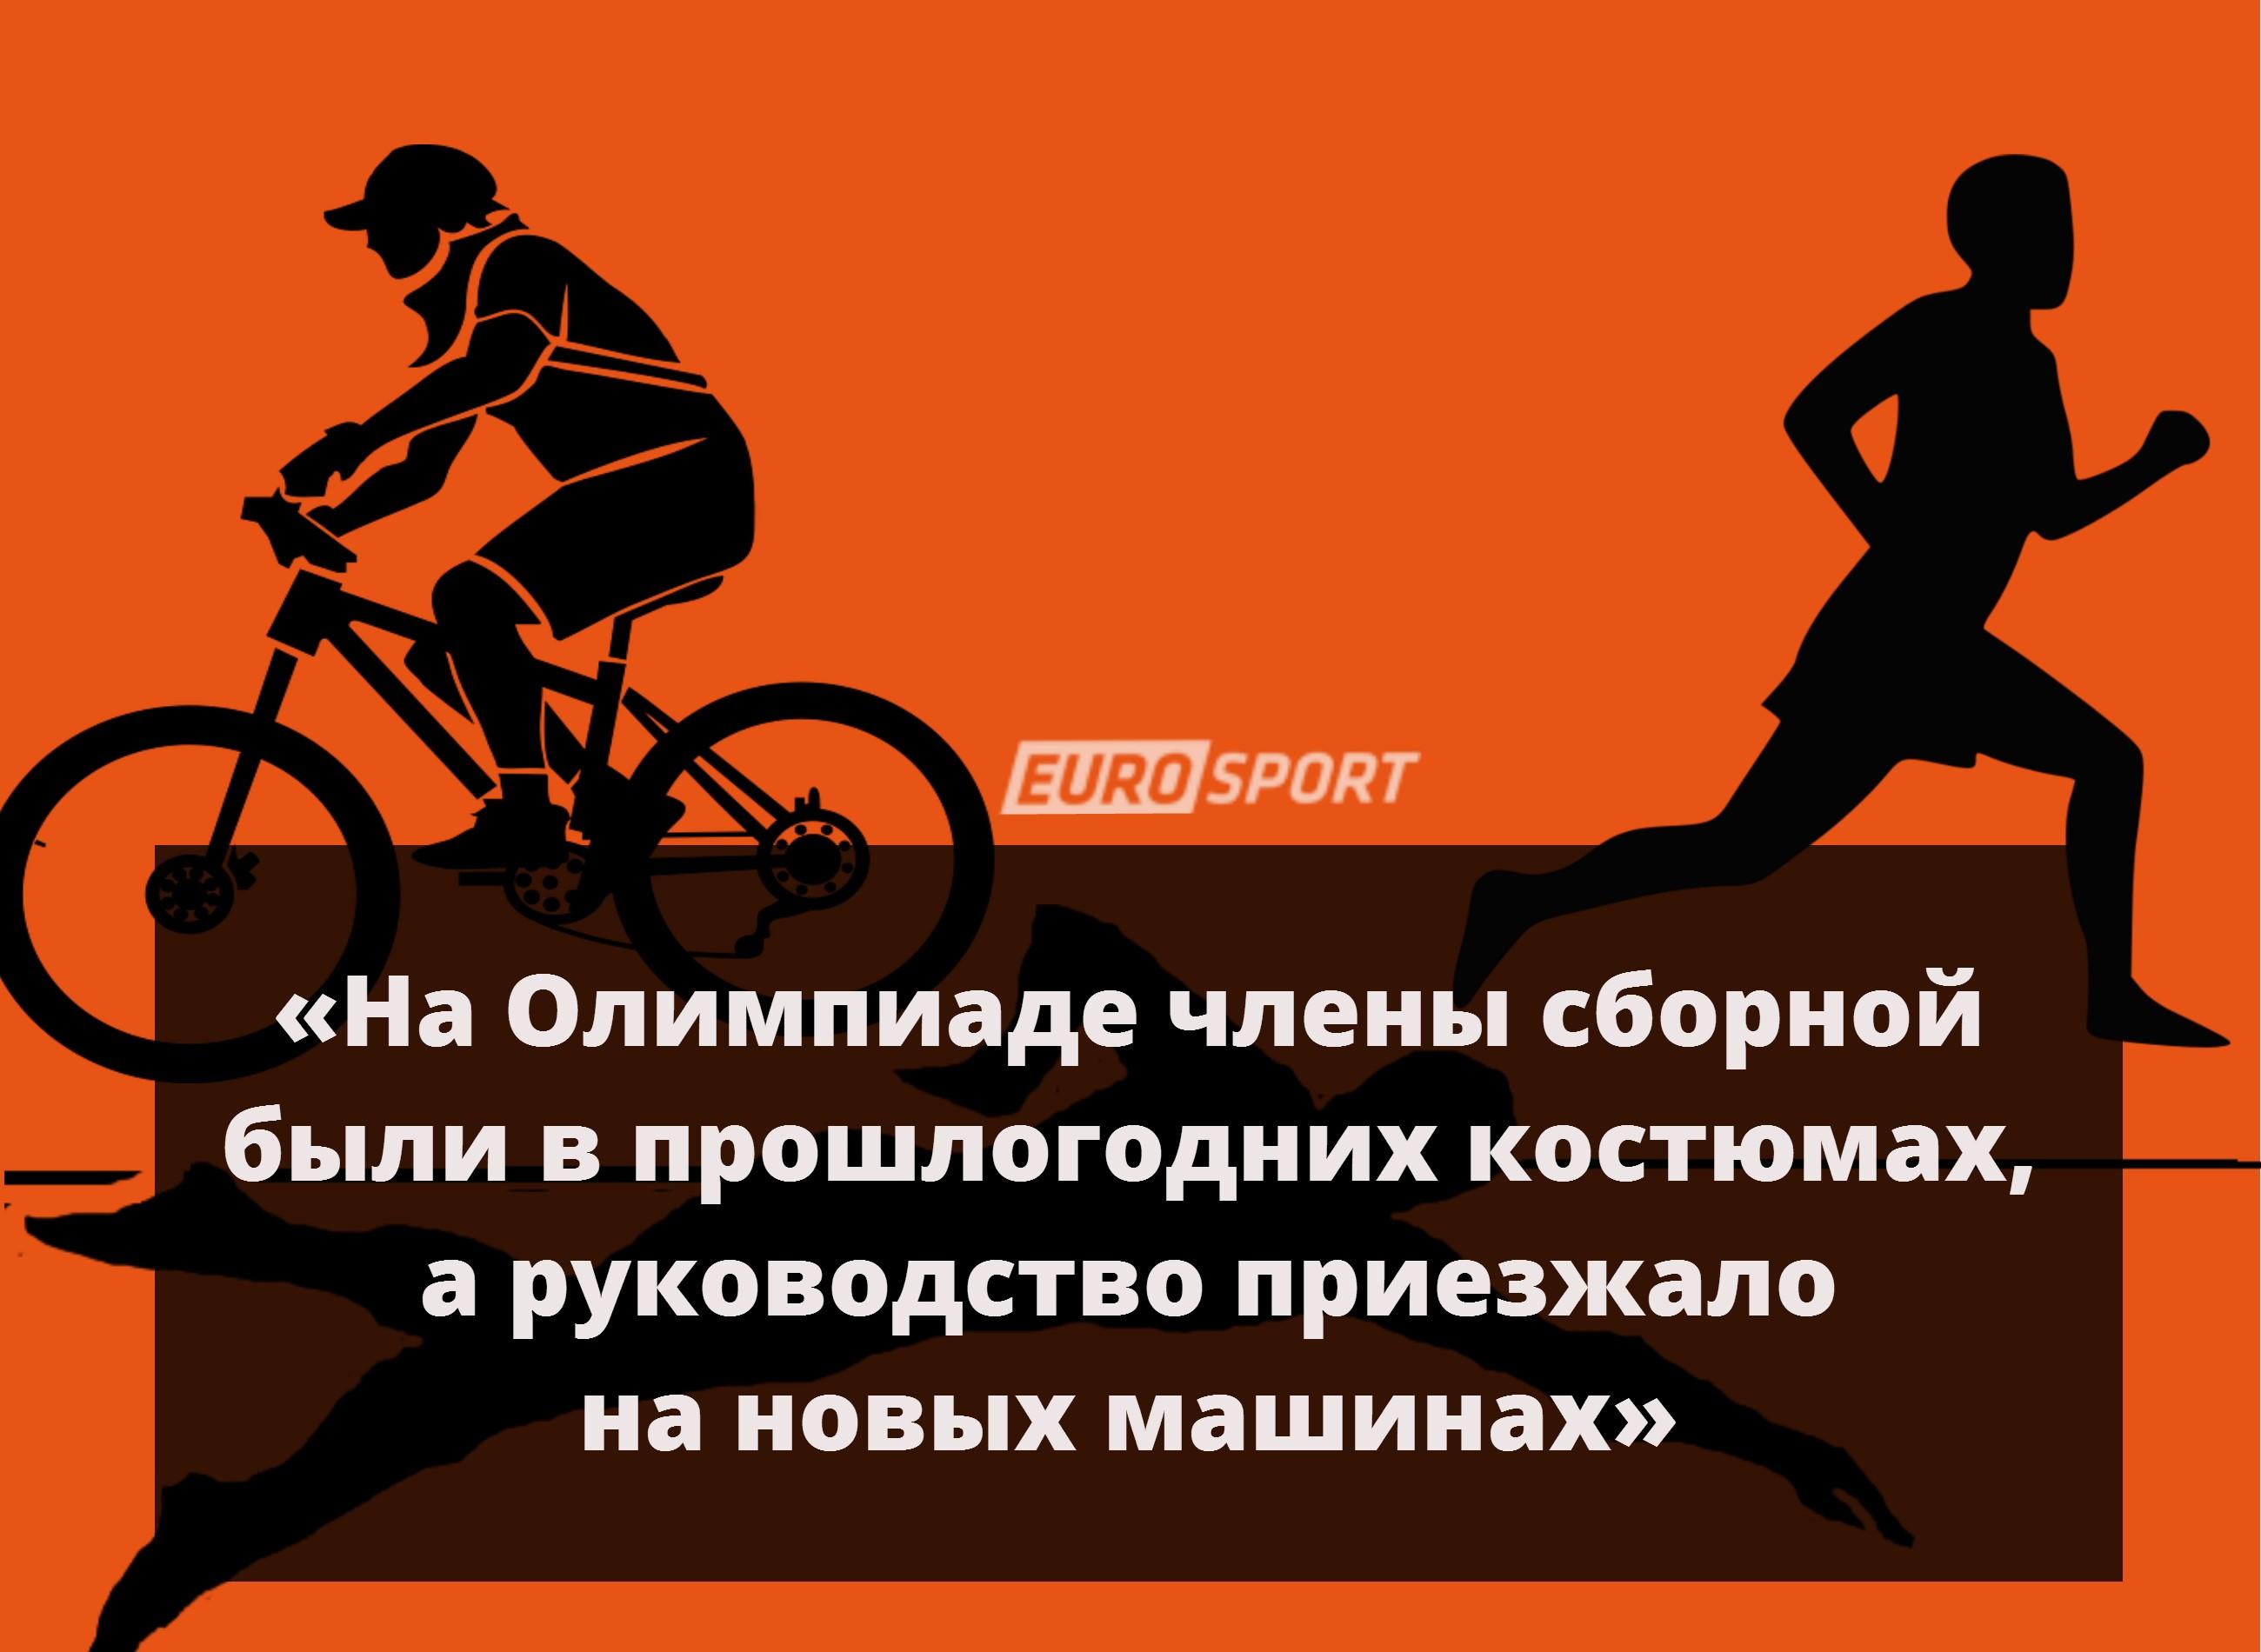 https://i.eurosport.com/2015/05/22/1567546.jpg